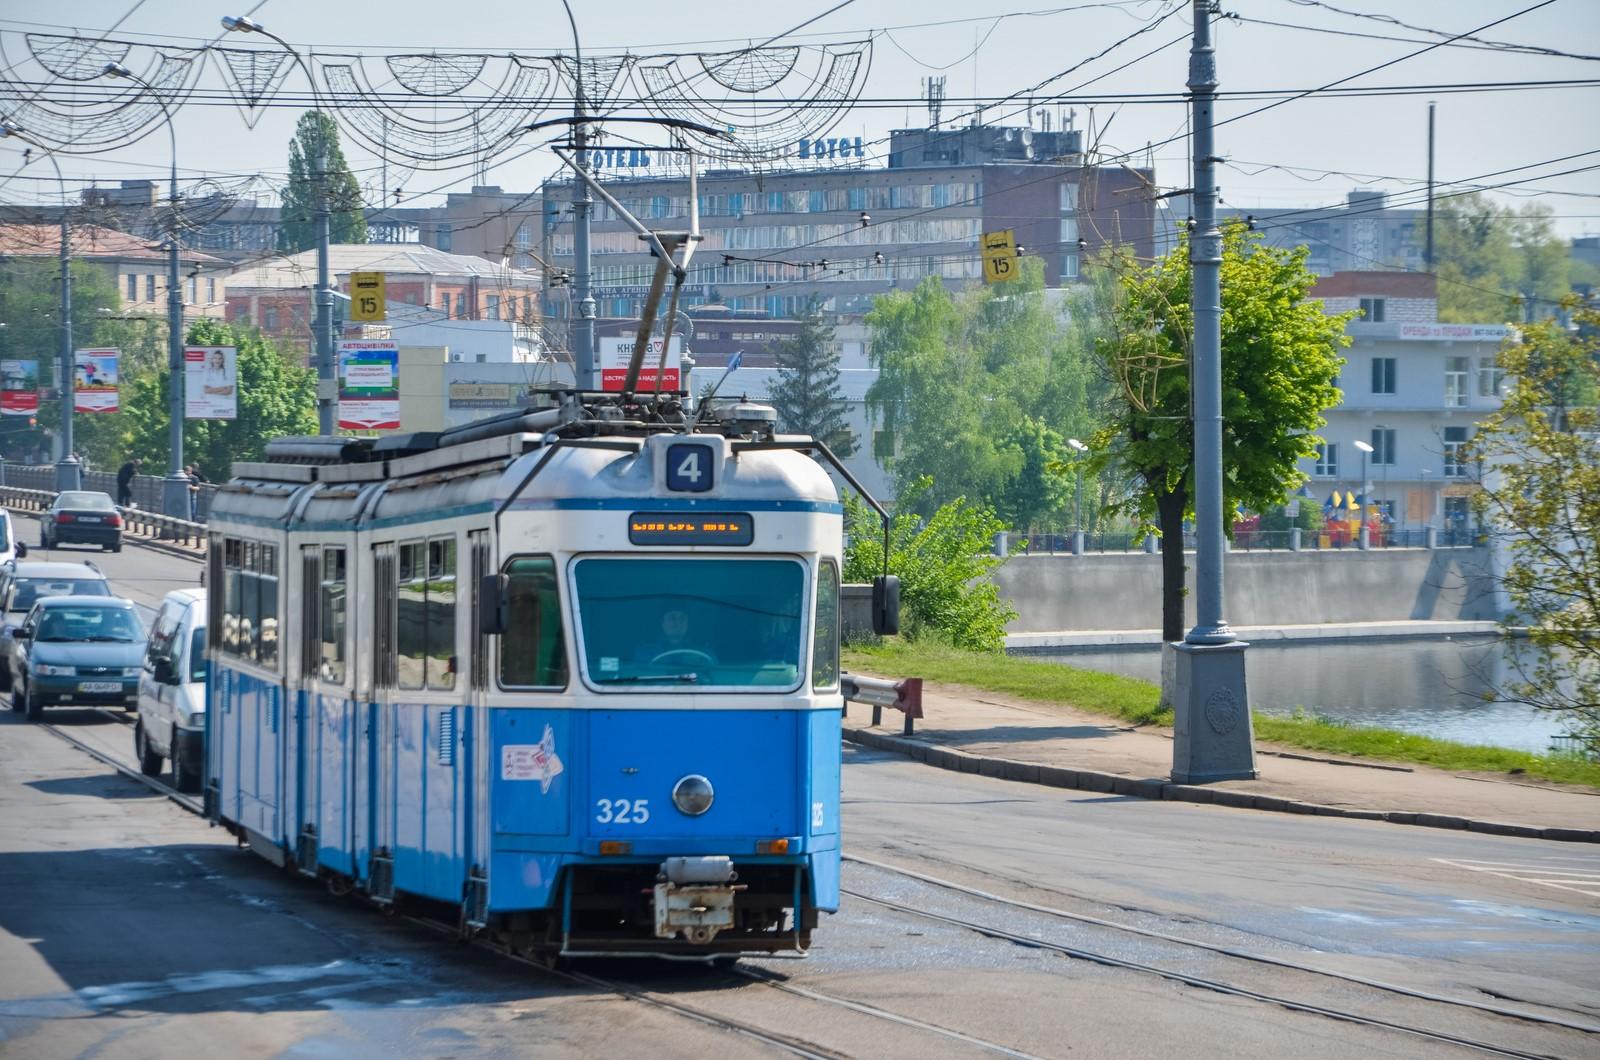 2014-05-09_Vinnitsa_14_Swiss_Tram